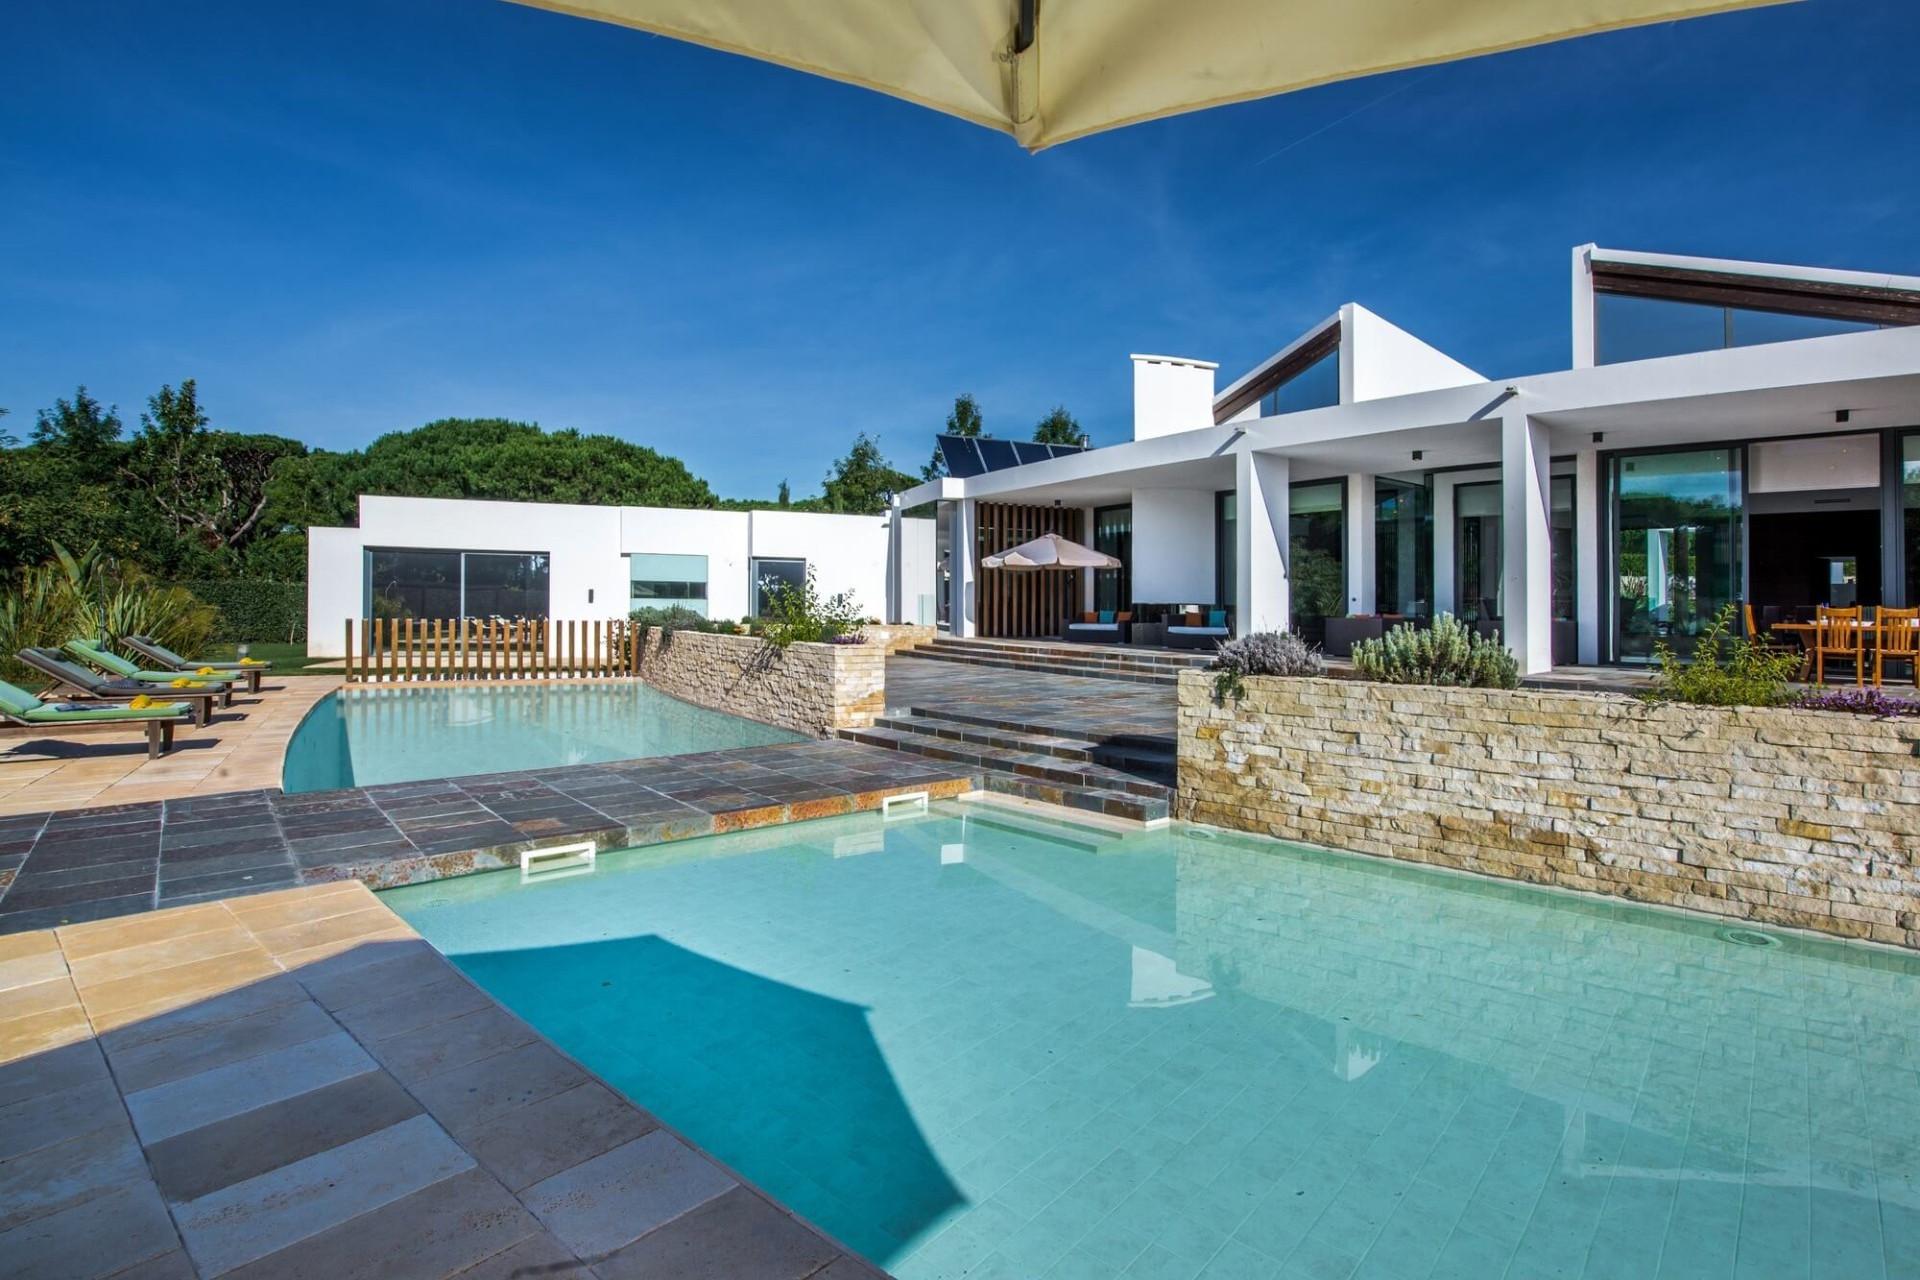 Modern 6 Bedroom Villa Vilamoura Heated Pool And Close To The Beach And Marina